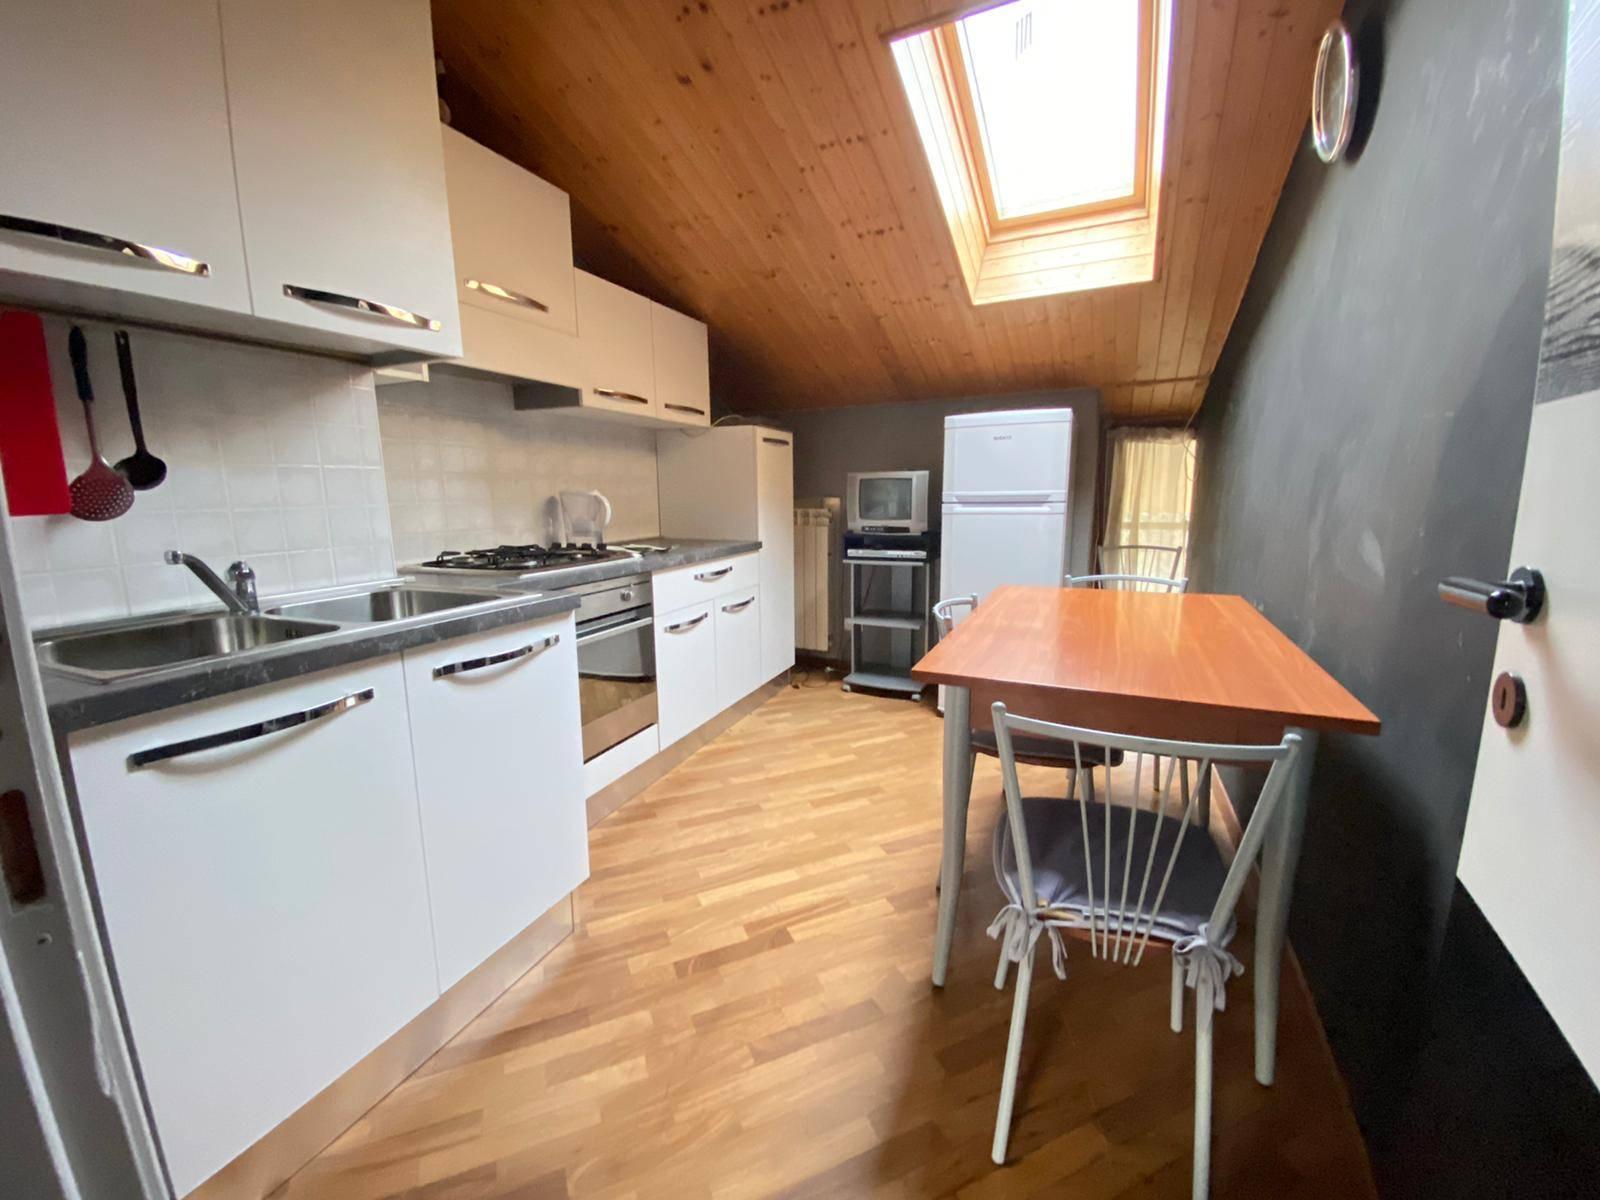 Sant'Ambrogio (TO): Appartamento mansardato